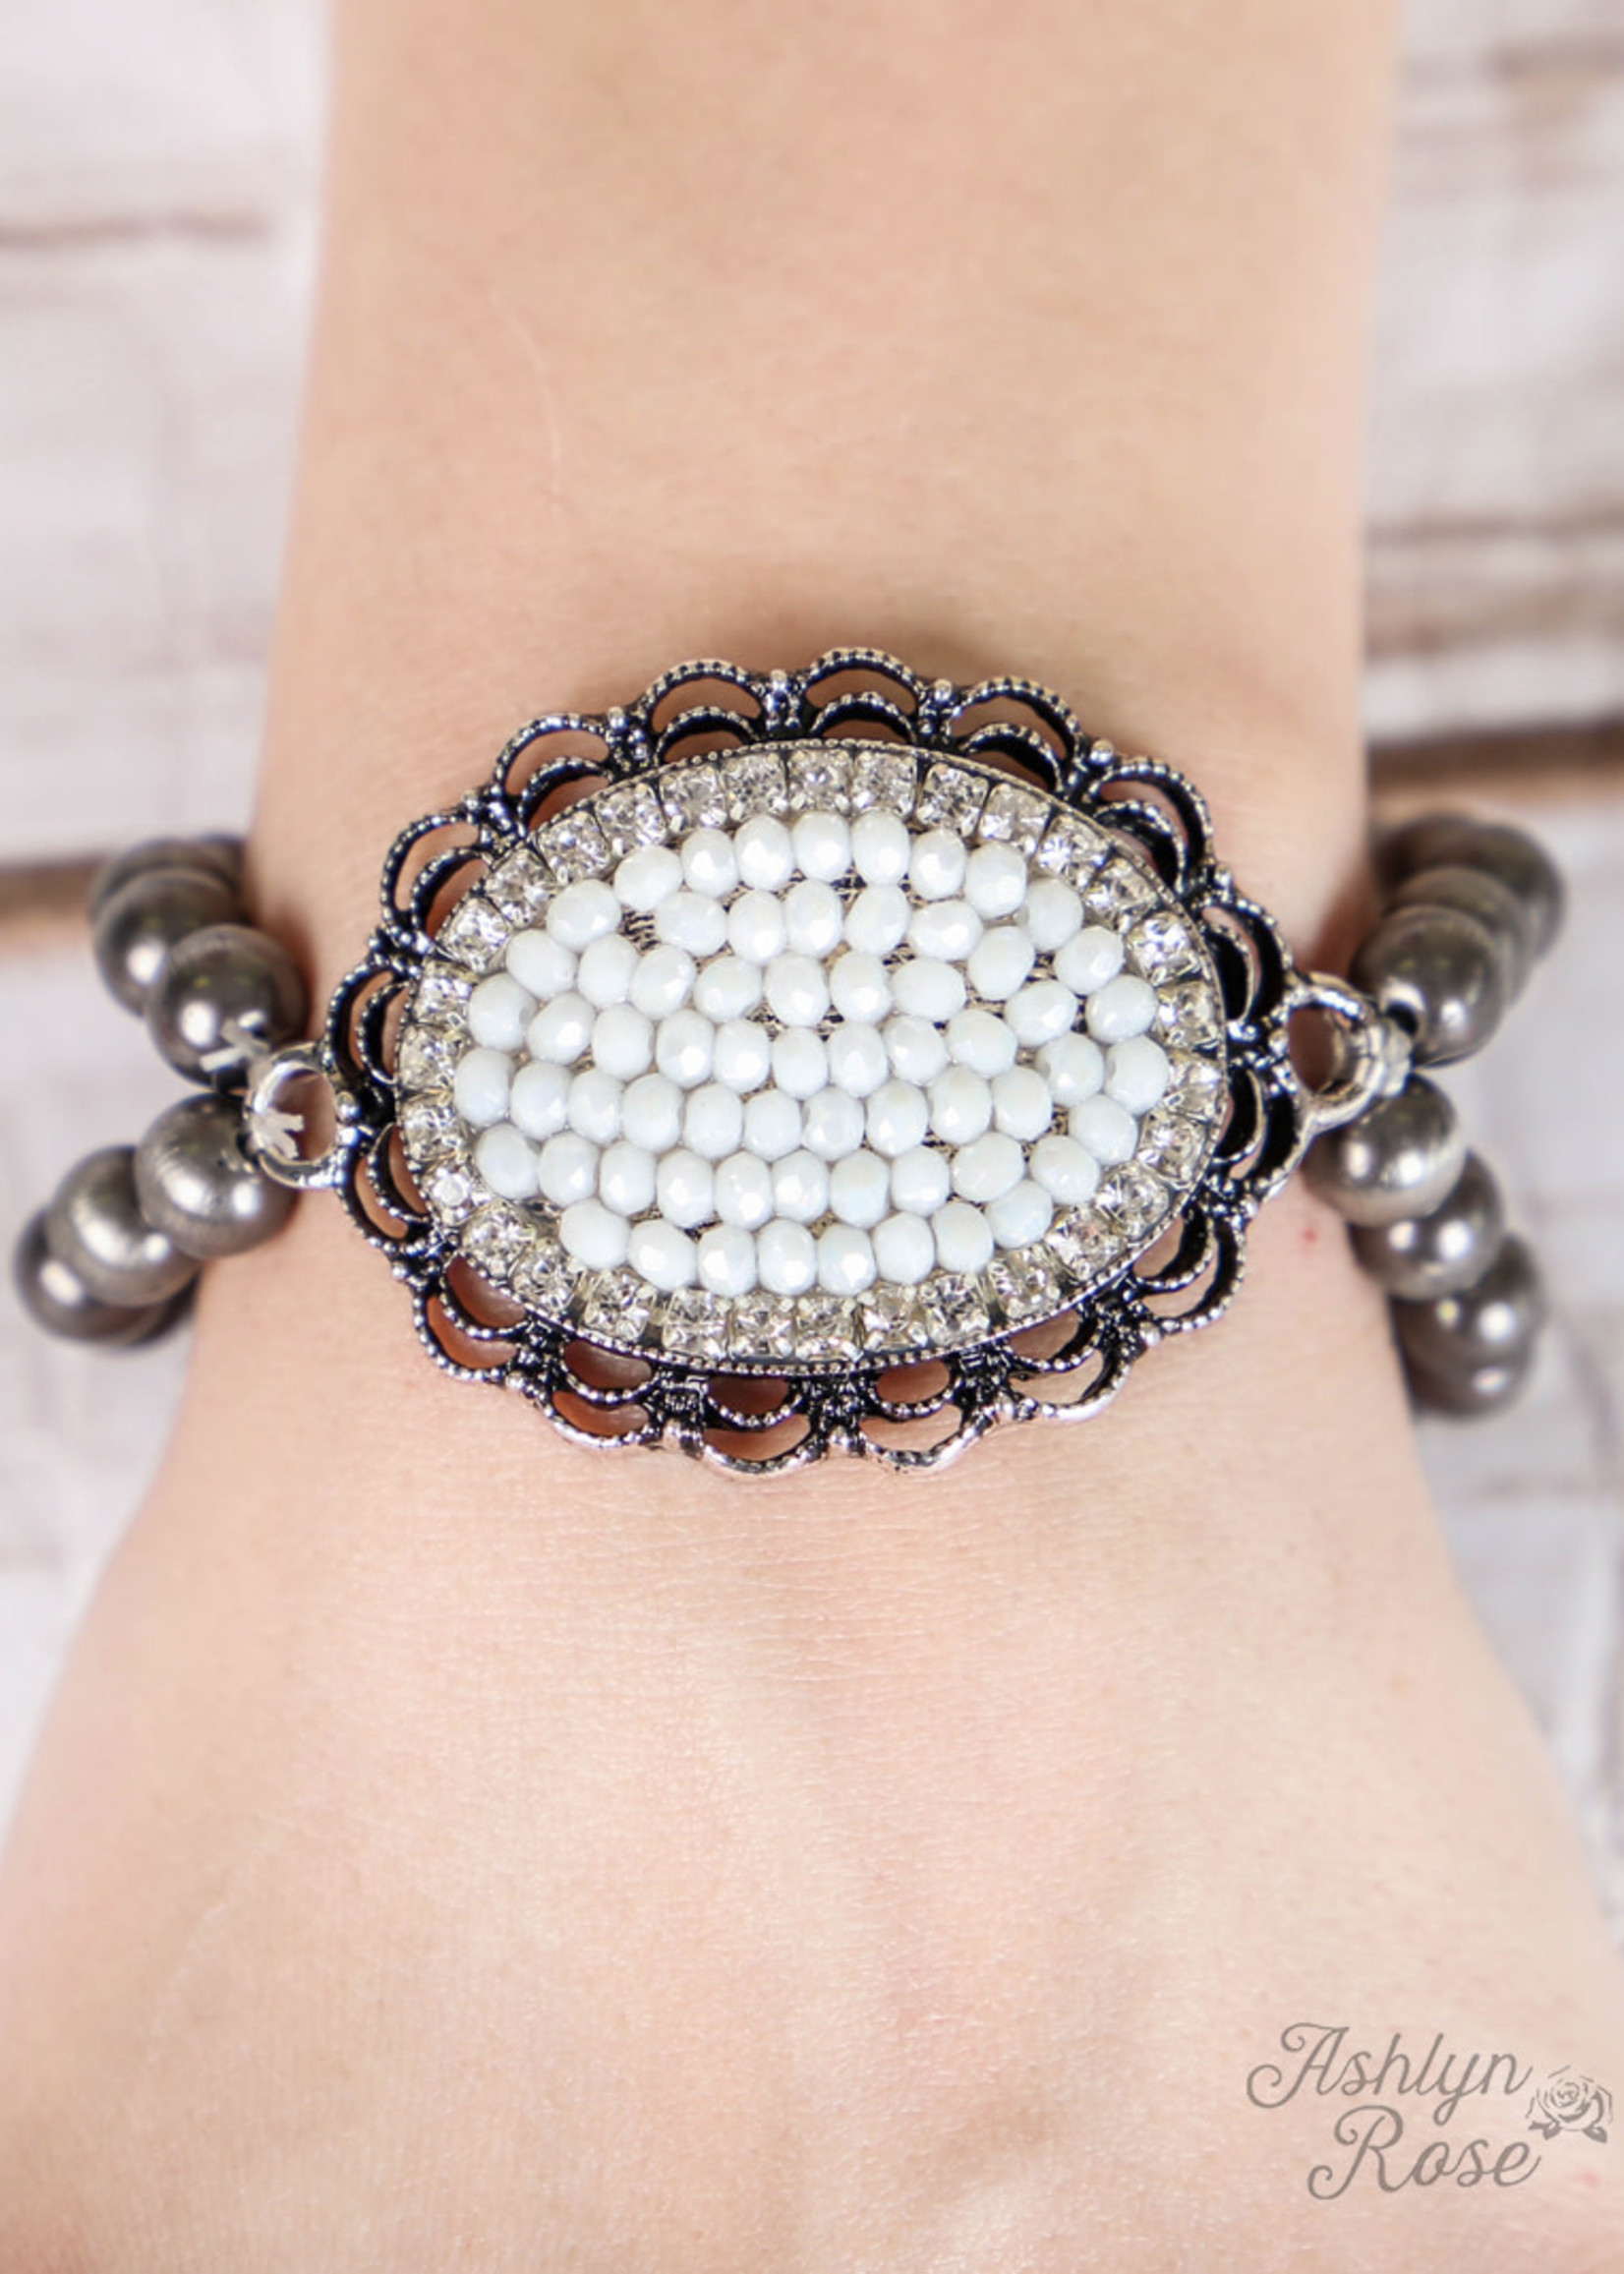 Crystal Oval Pendant on Two-Strand Silver Beaded Bracelet